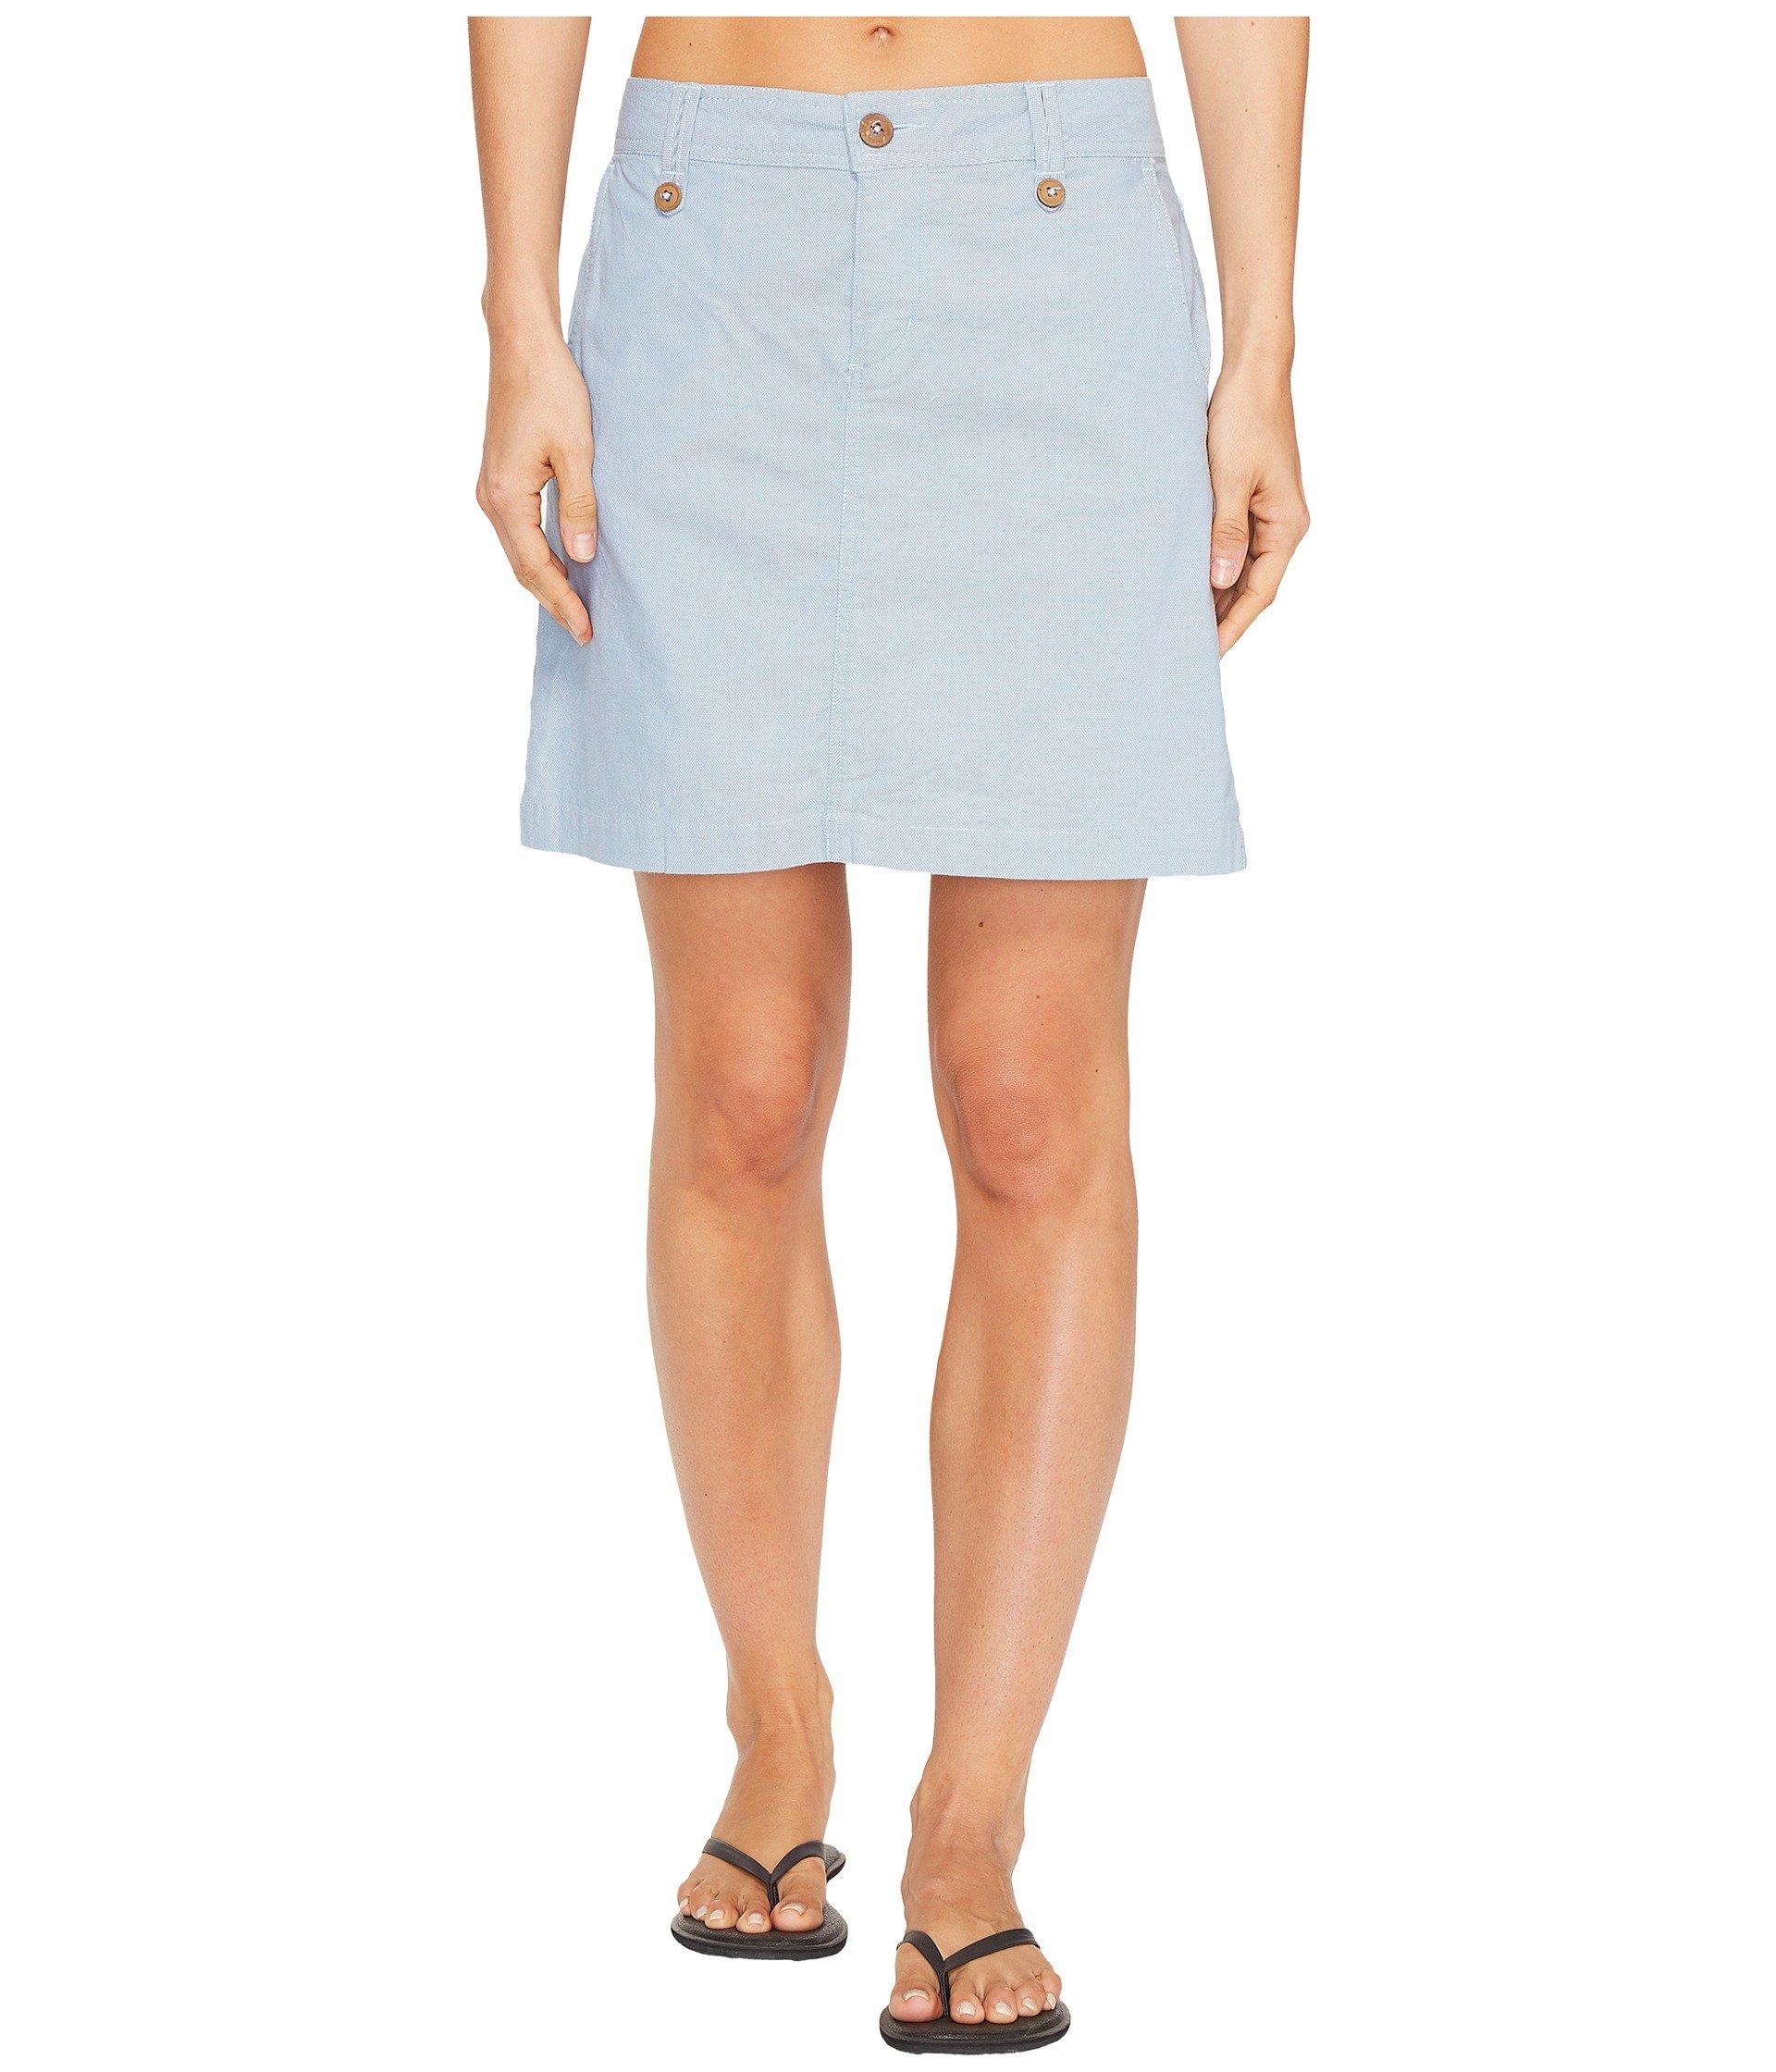 1920x2240 Mountain Khakis Women's Clothing Island Skirt Blue Ridge Classic